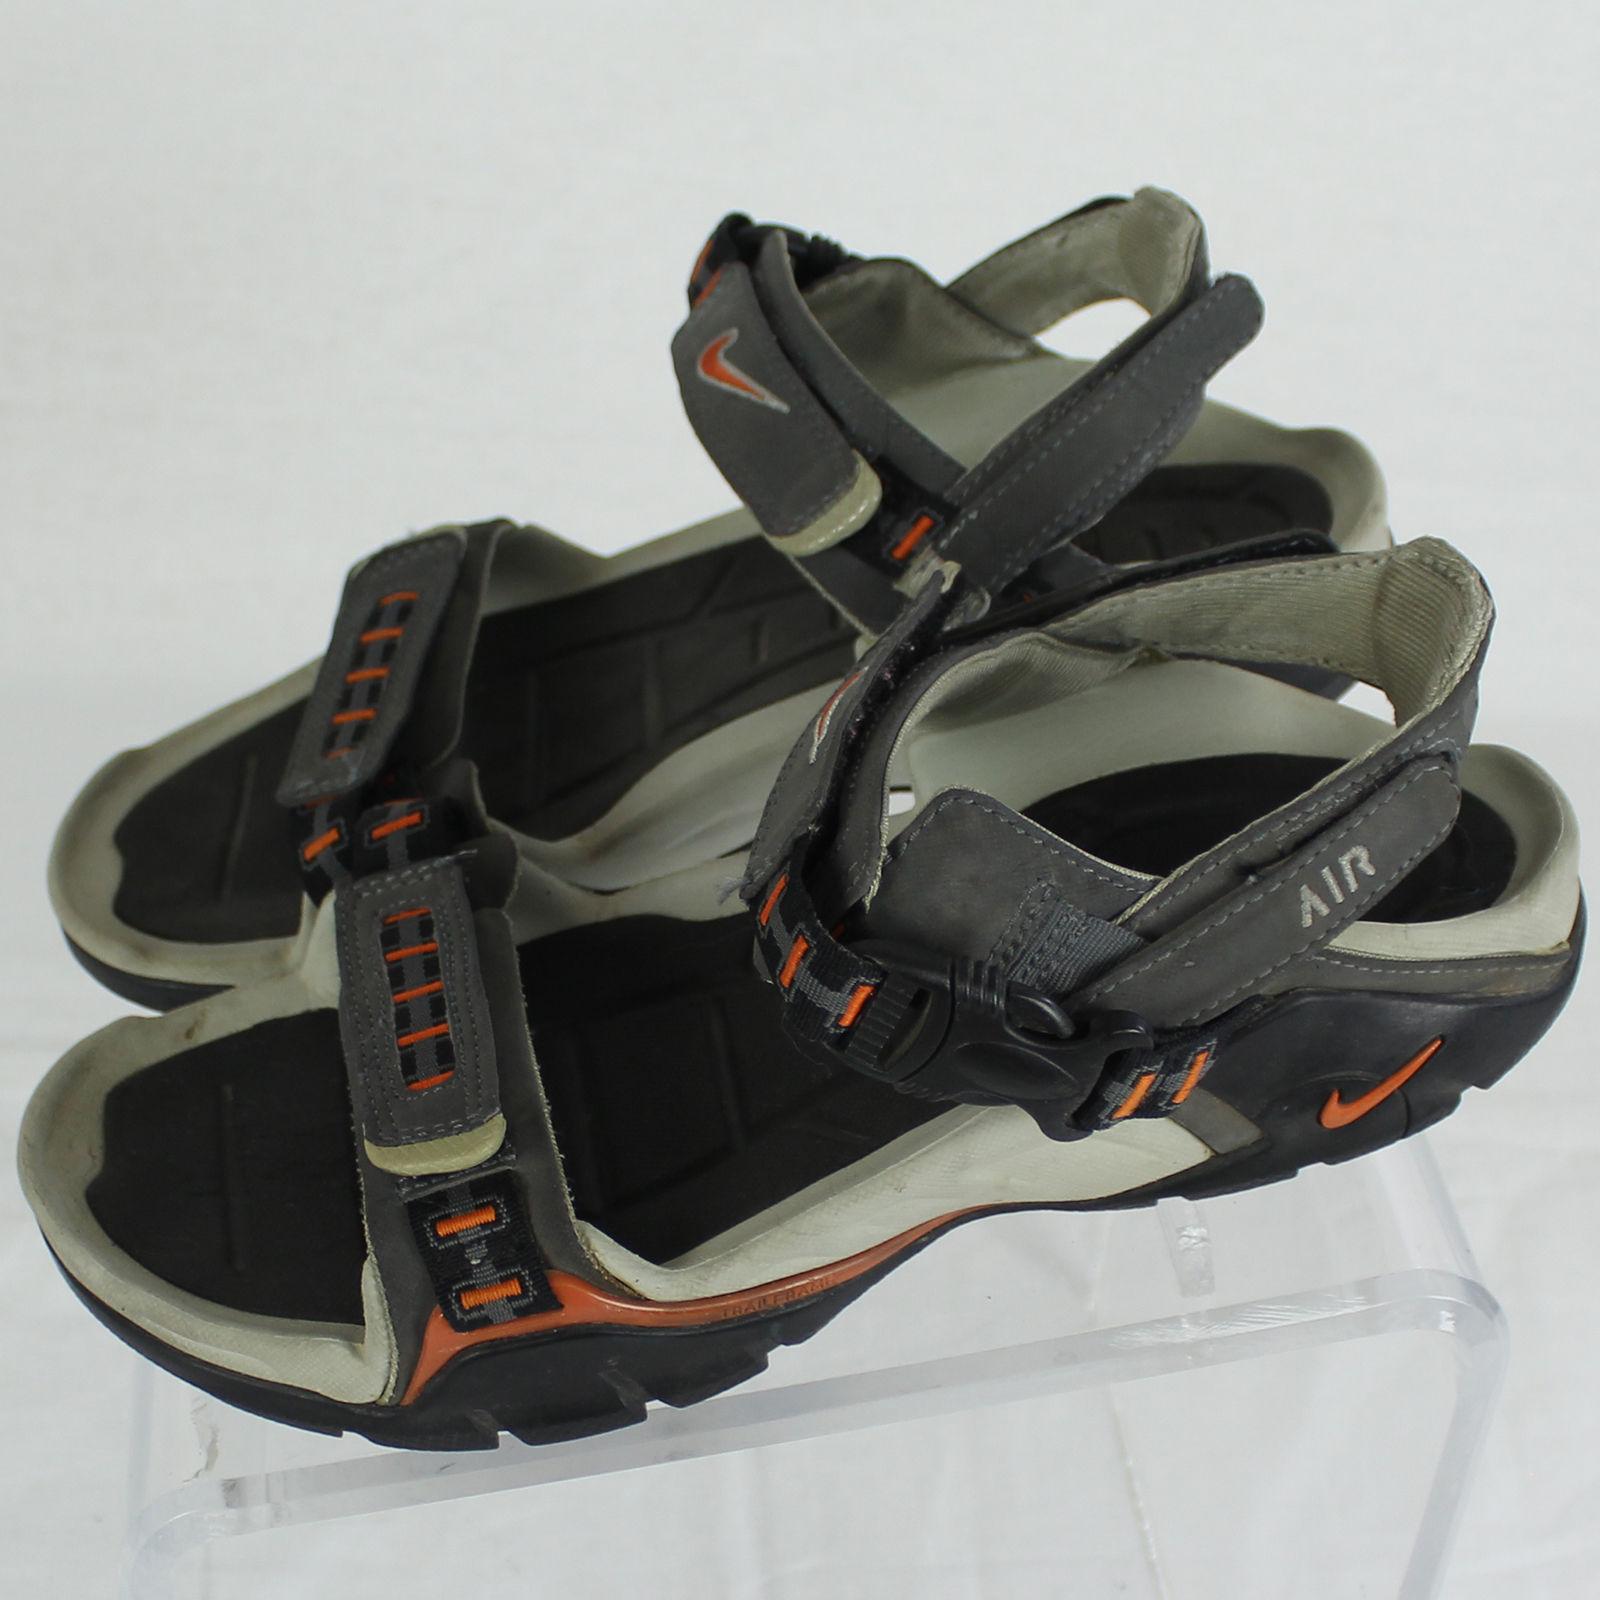 497cec7f02c0 ... top quality nike acg air velcro buckle strap sport sandal trail walking  men sz 7d m ...